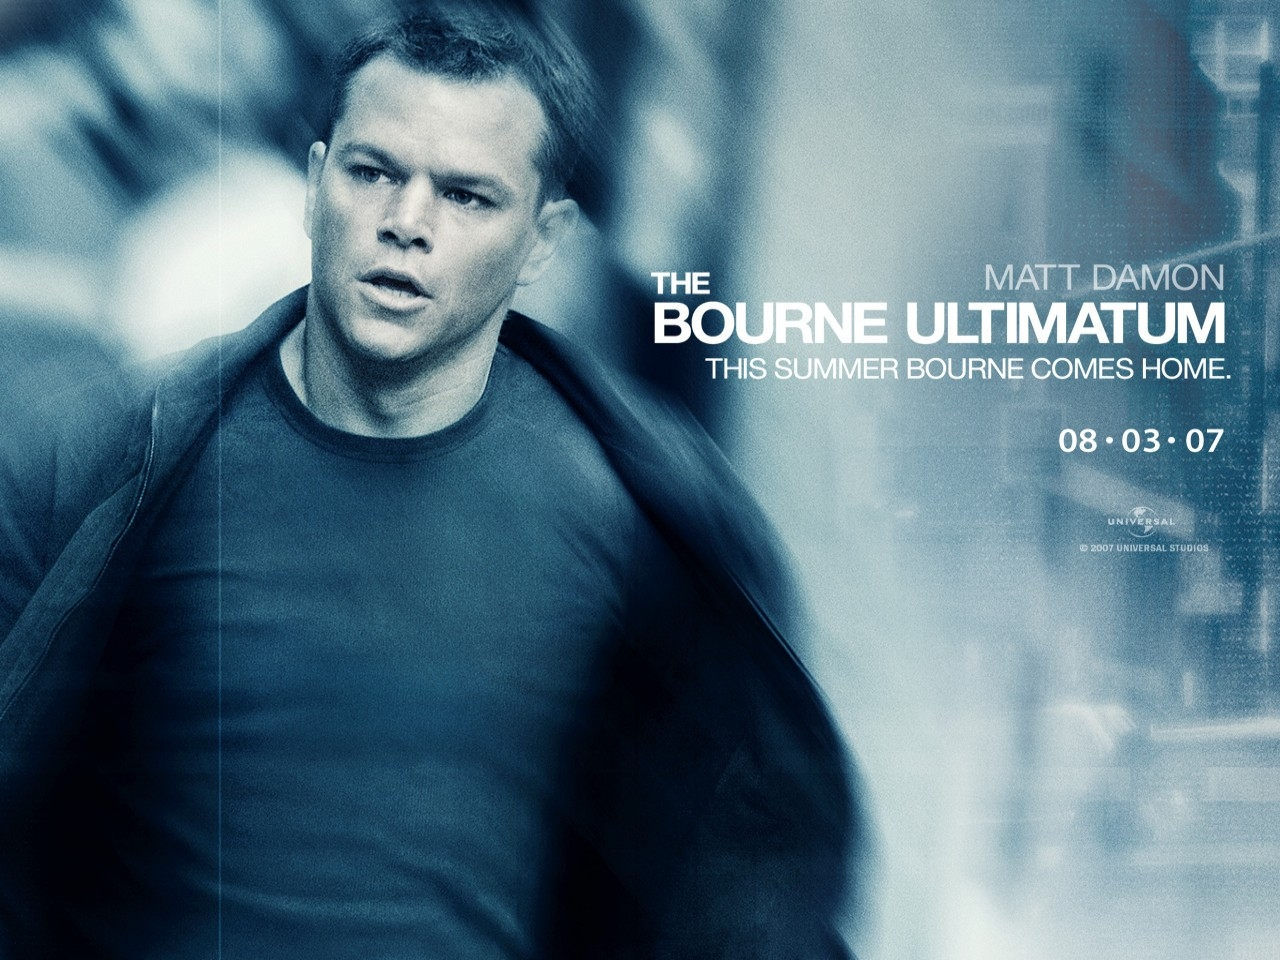 Wallpaper del thriller The Bourne Ultimatum